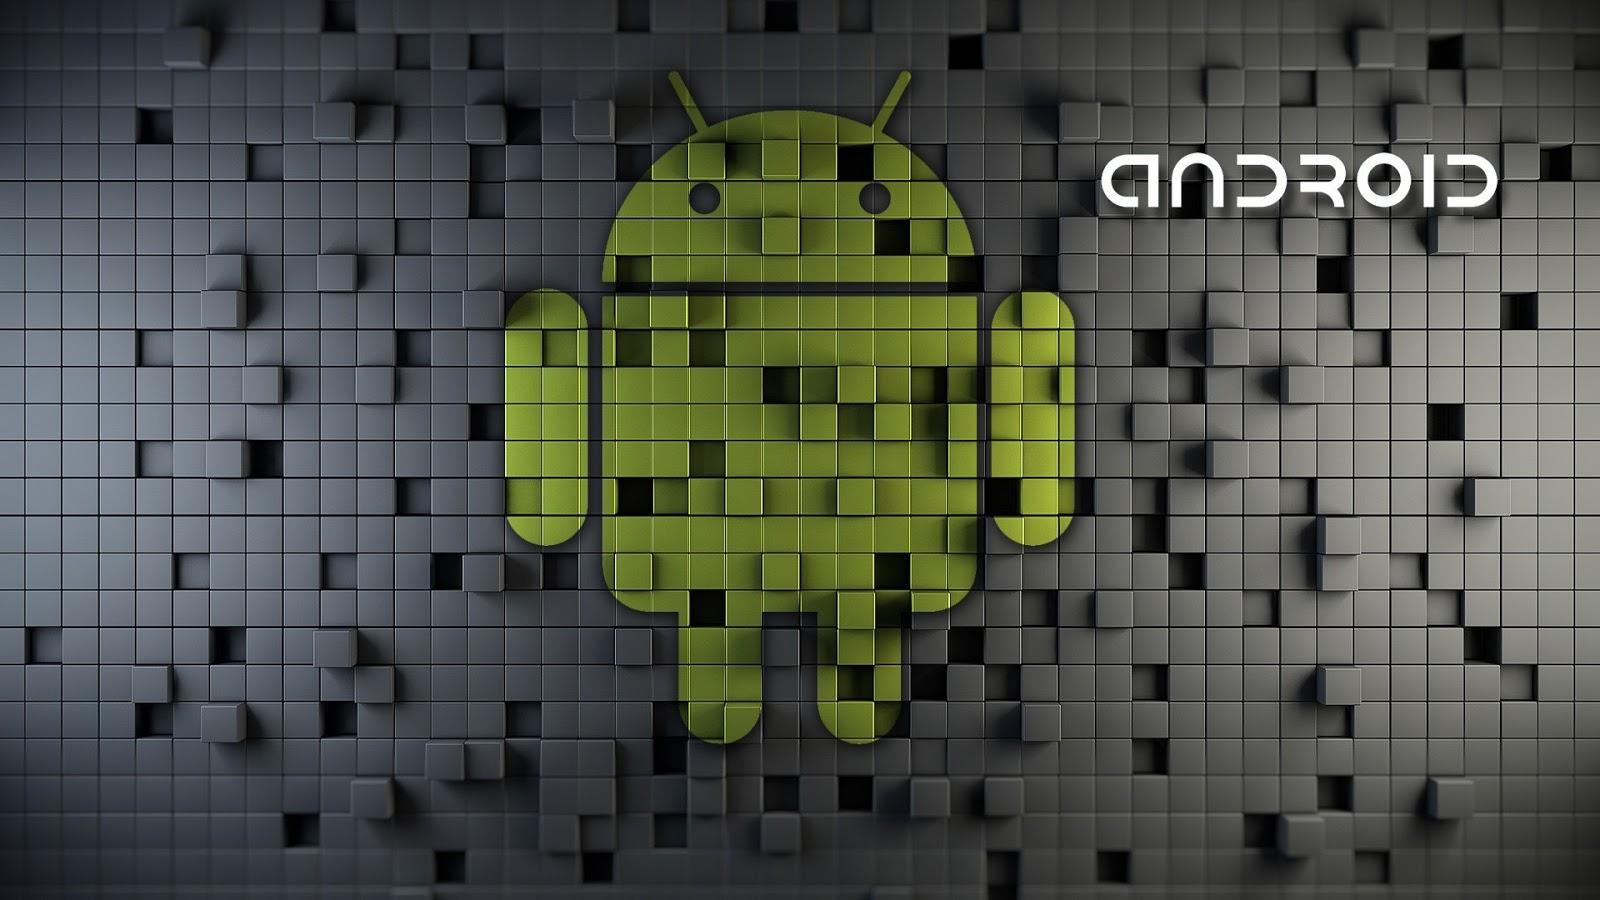 http://1.bp.blogspot.com/-0Zx3bXIgvSI/UP5MAVifkJI/AAAAAAAASO8/HX2qzYy-xLs/s1600/android-3d-cube.jpg